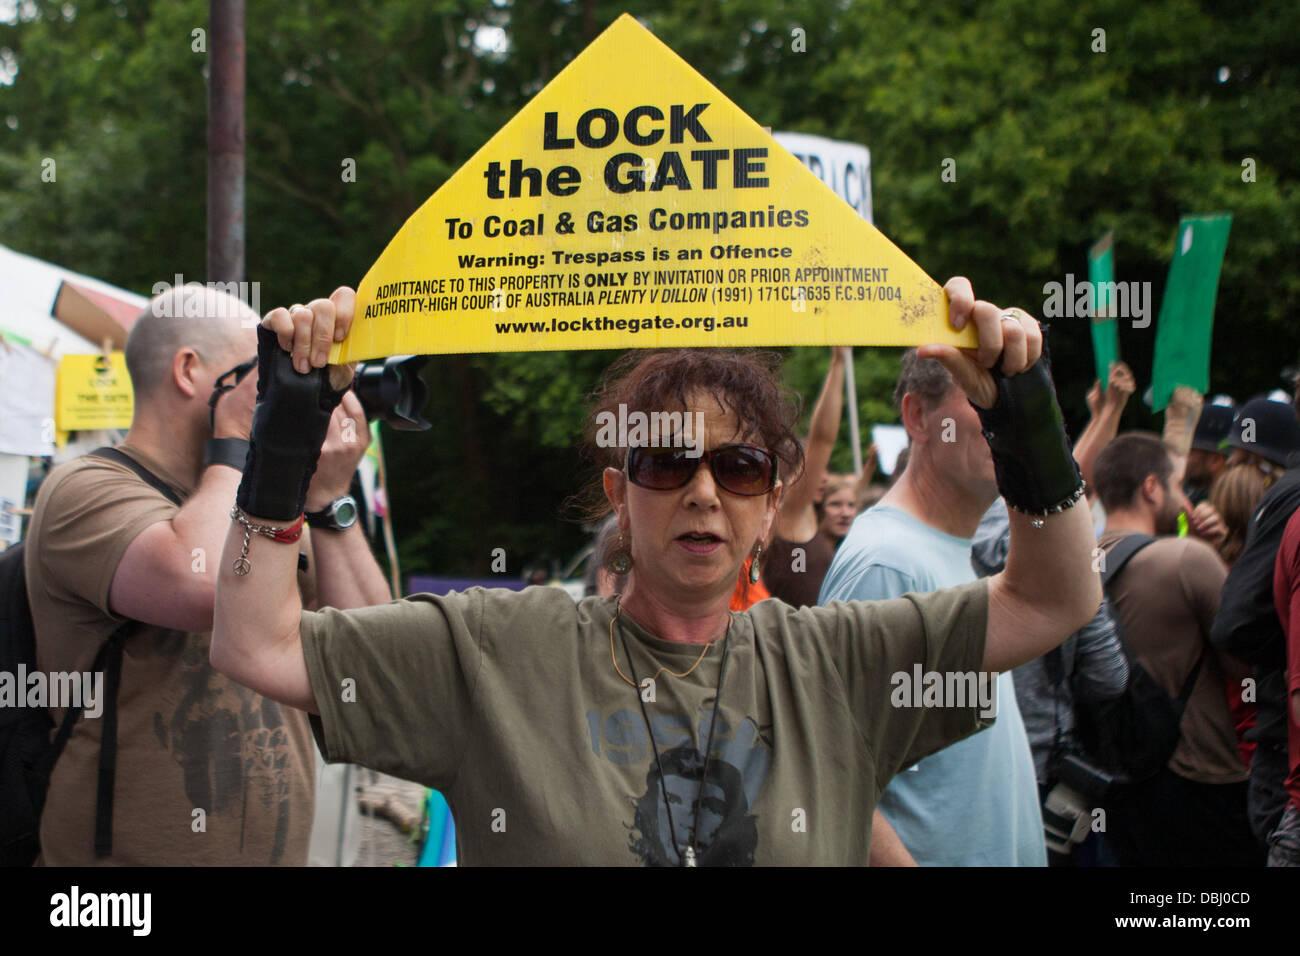 Balcombe, West Sussex, UK. 31. Juli 2013. Frau hält empor schloss das Tor-Plakat. Protest gegen Cuadrilla Bohren & Fracking vor den Toren des Dorfes Balcombe in West Sussex. Balcombe, West Sussex, UK. Bildnachweis: Martyn Wheatley/Alamy Live News Stockfoto